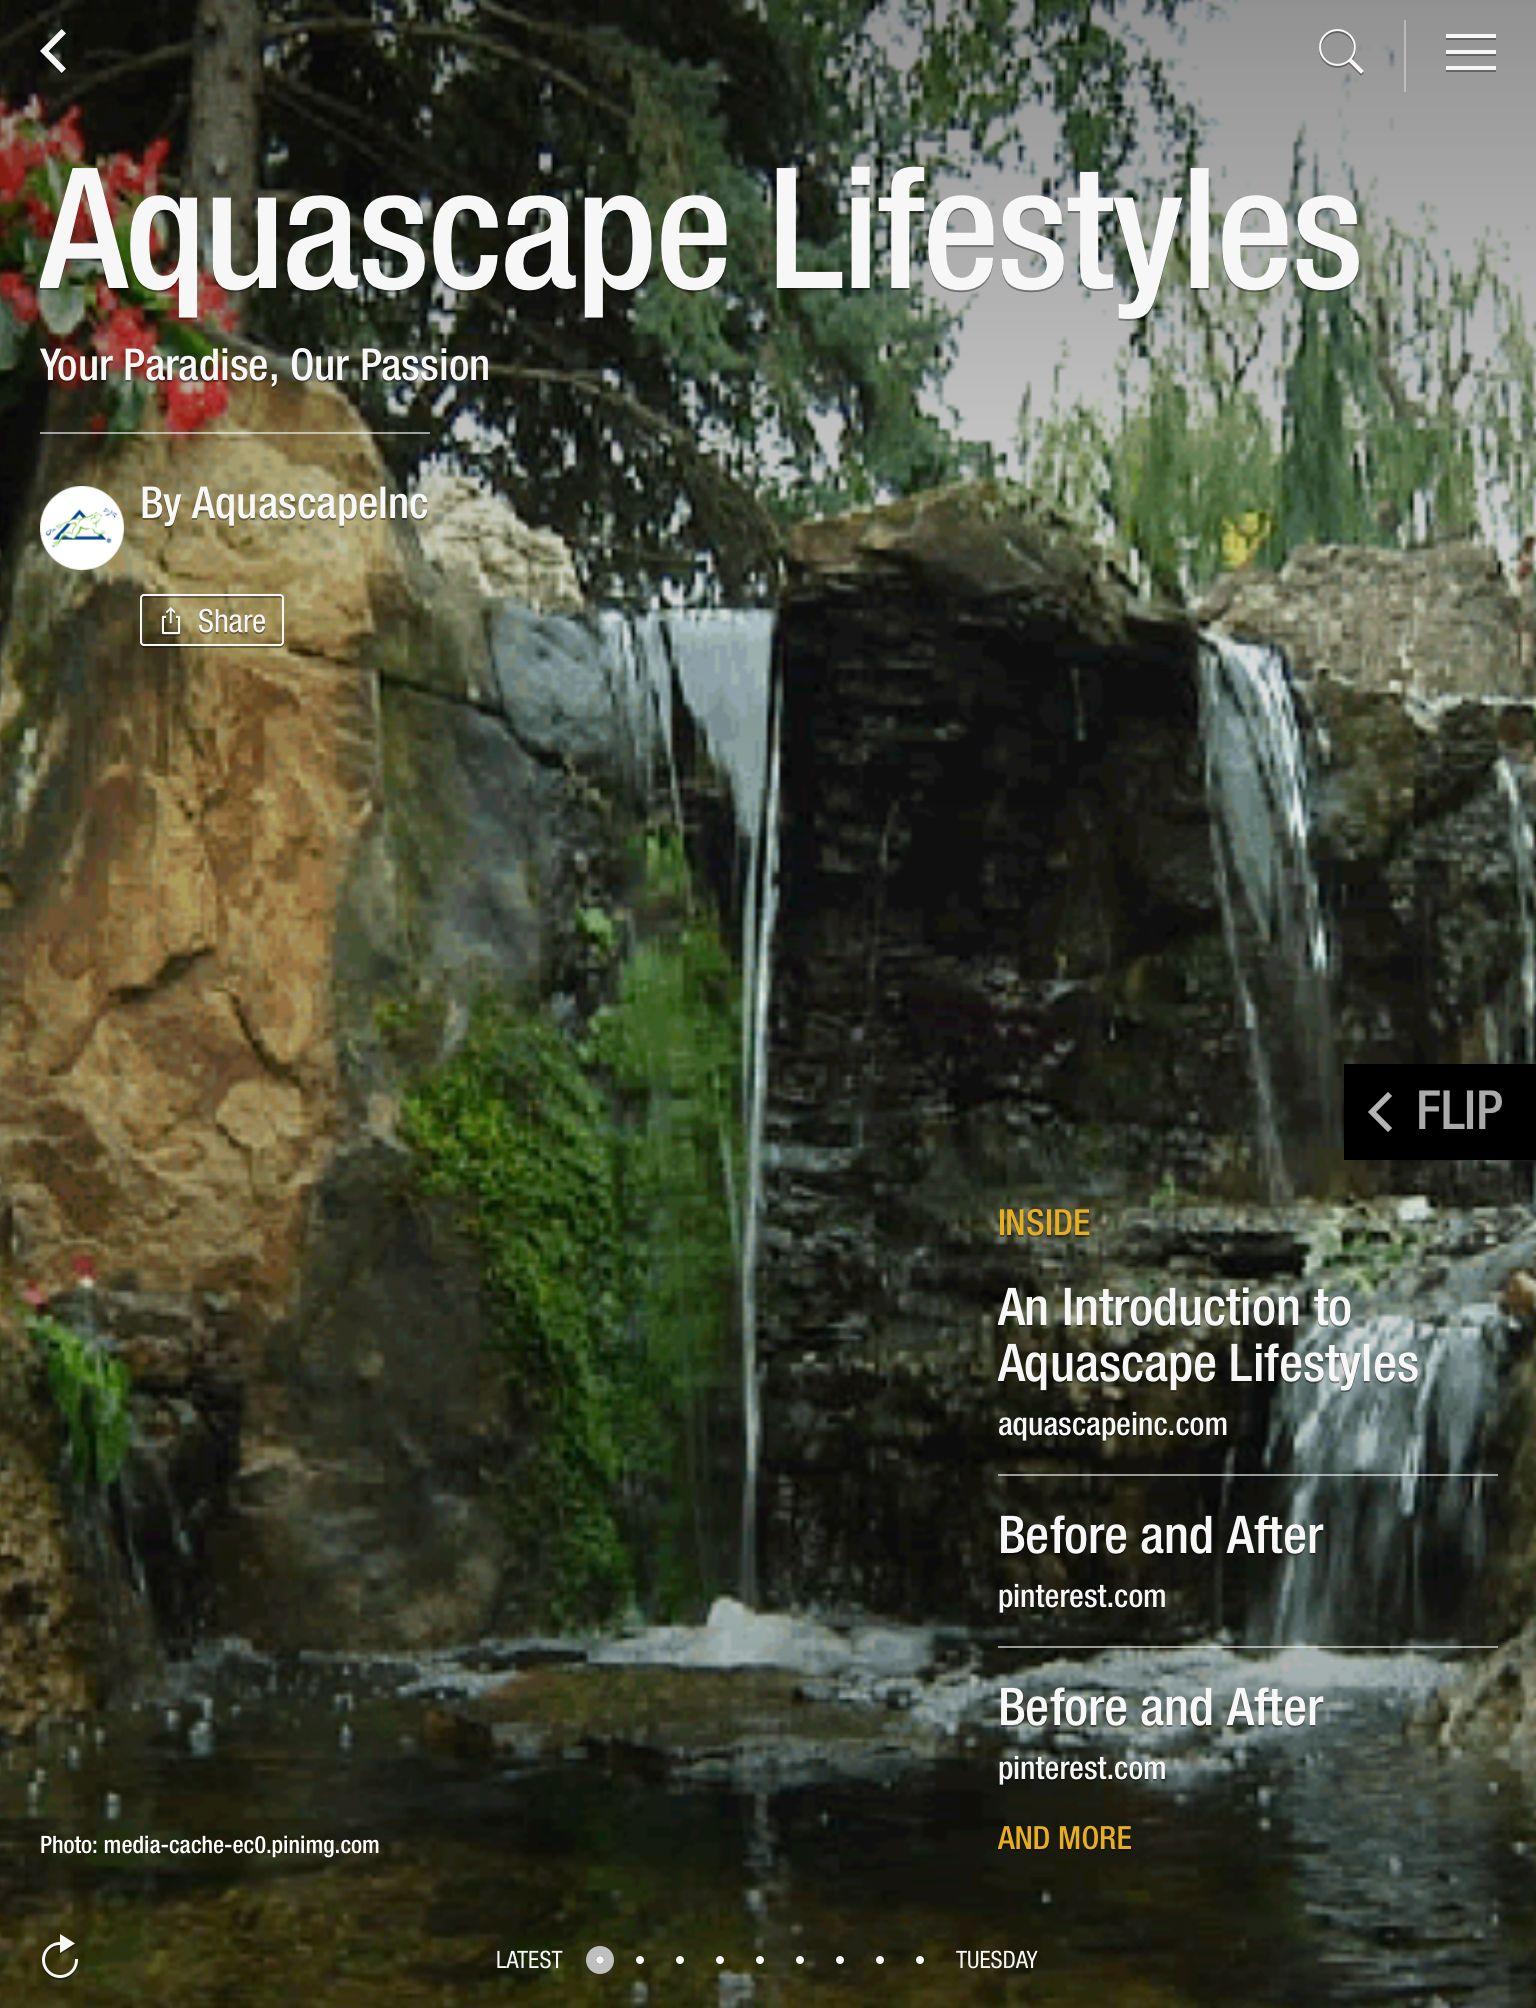 NEW! Aquascape Lifestyles Flipboard Magazine | Aquascape ...